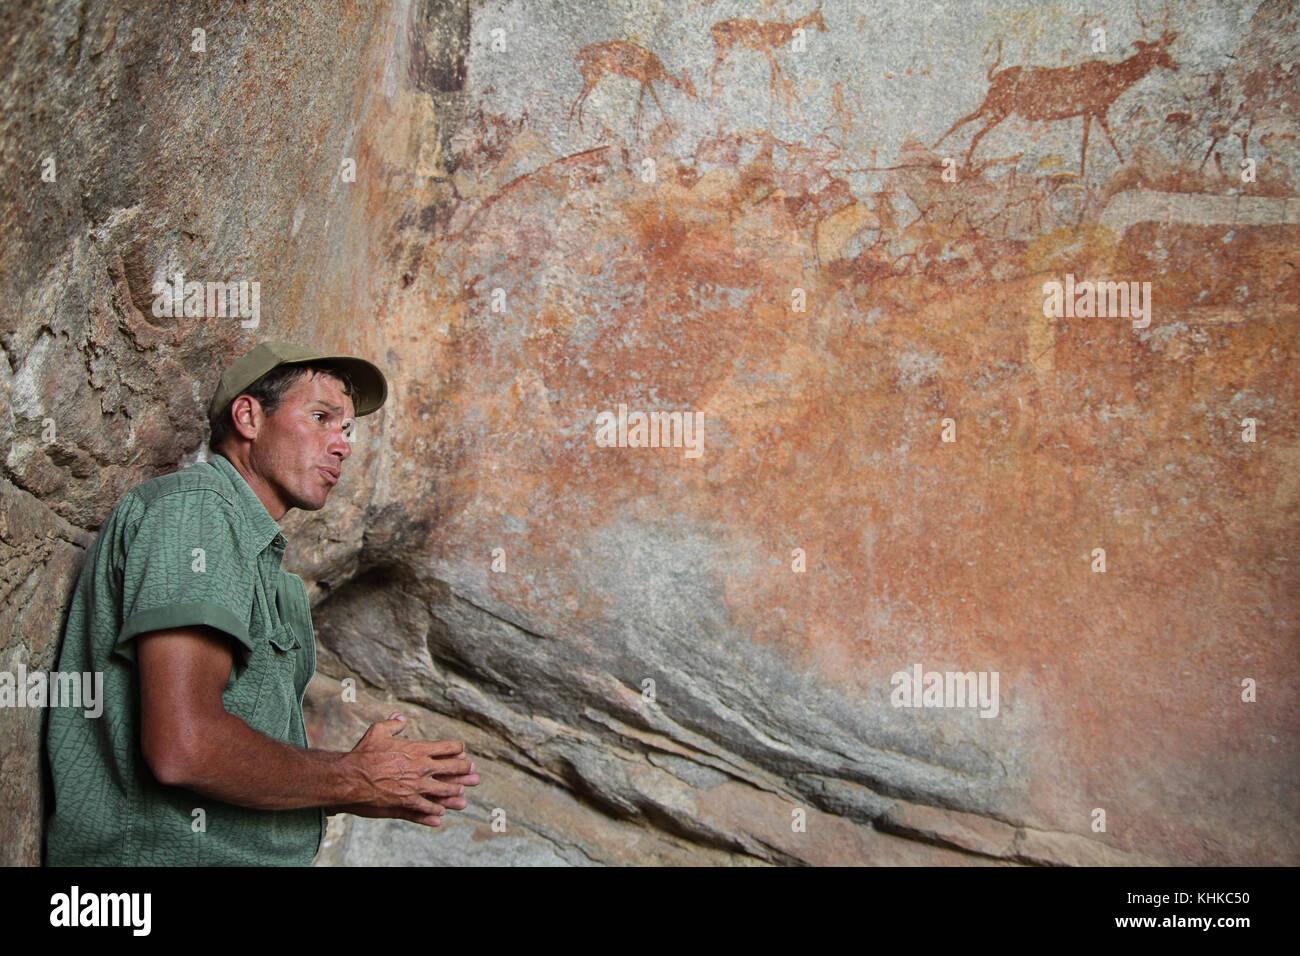 MATOPO, ZIMBABWE -  17 October. Game ranger Ian Harmer talks to tourists about bushmen rock painting in the Nswatugi - Stock Image